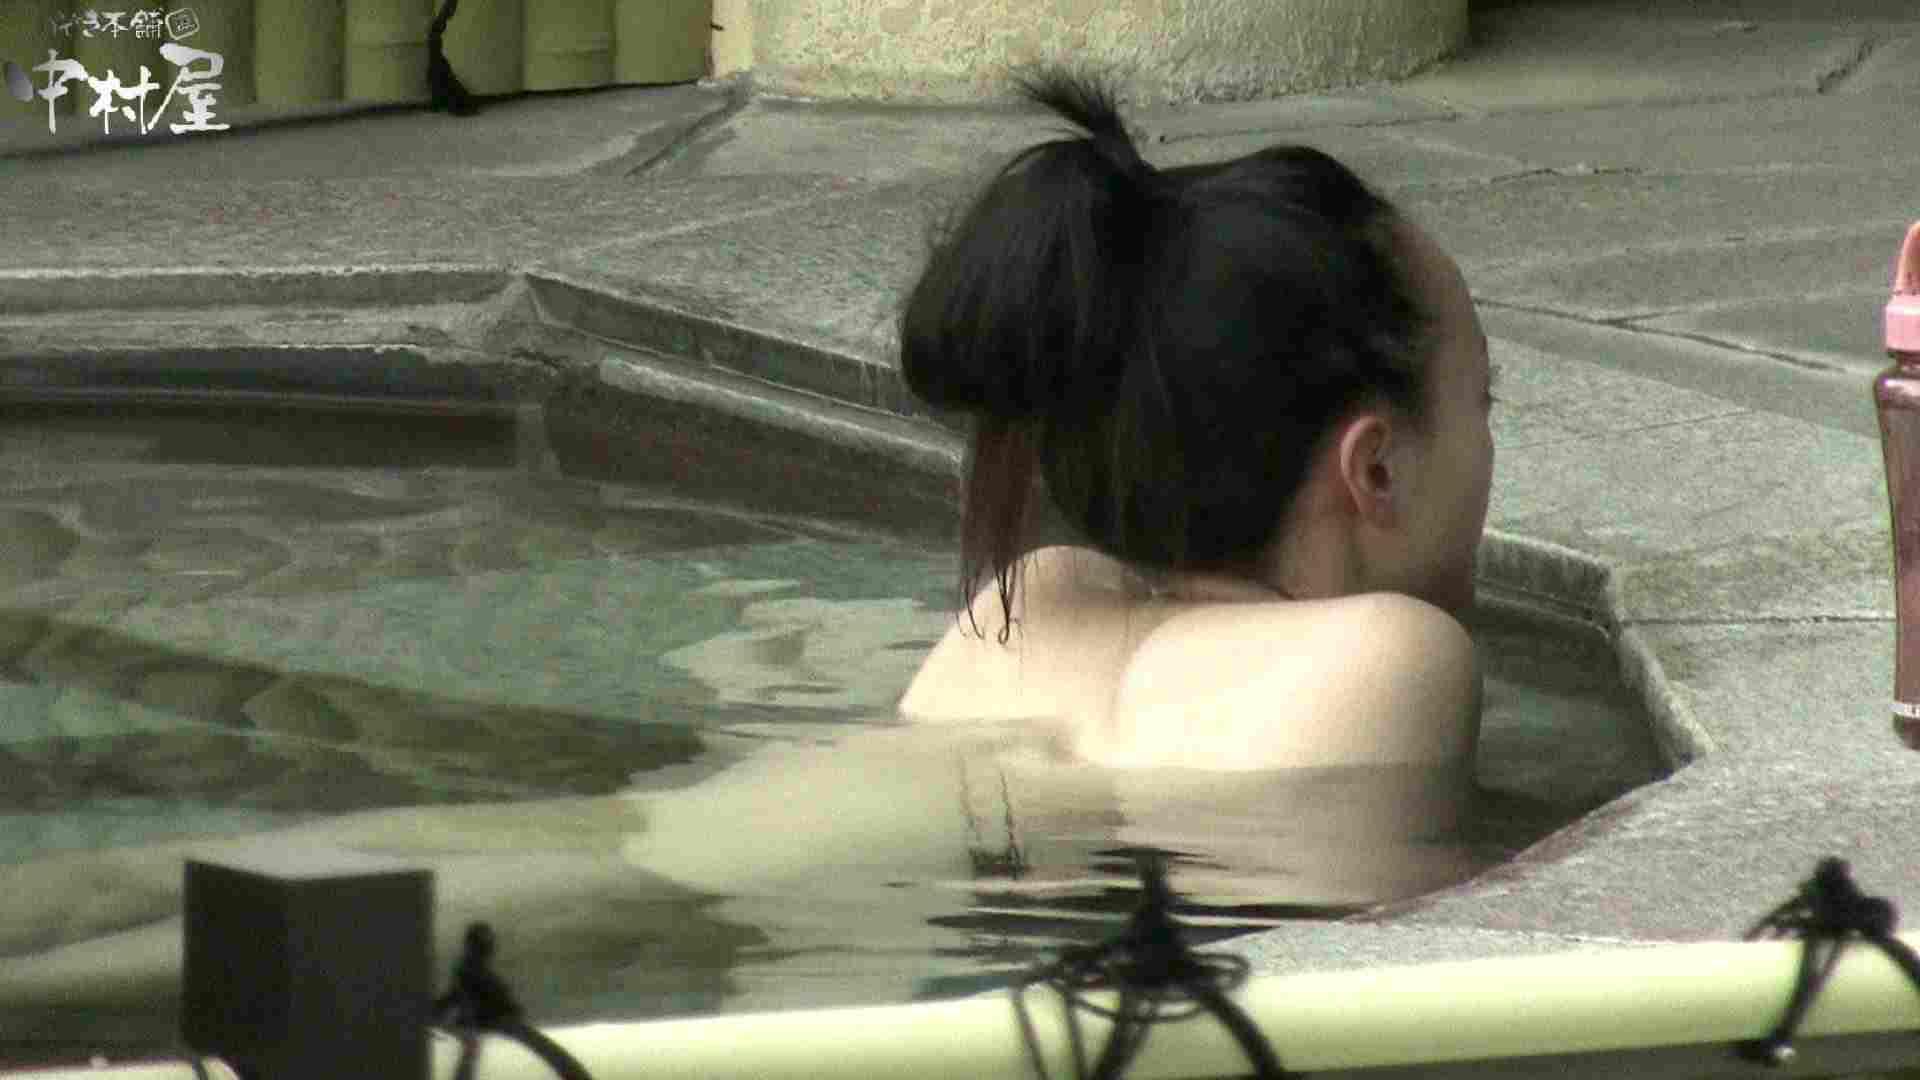 Aquaな露天風呂Vol.900 OLのエロ生活 すけべAV動画紹介 88連発 41